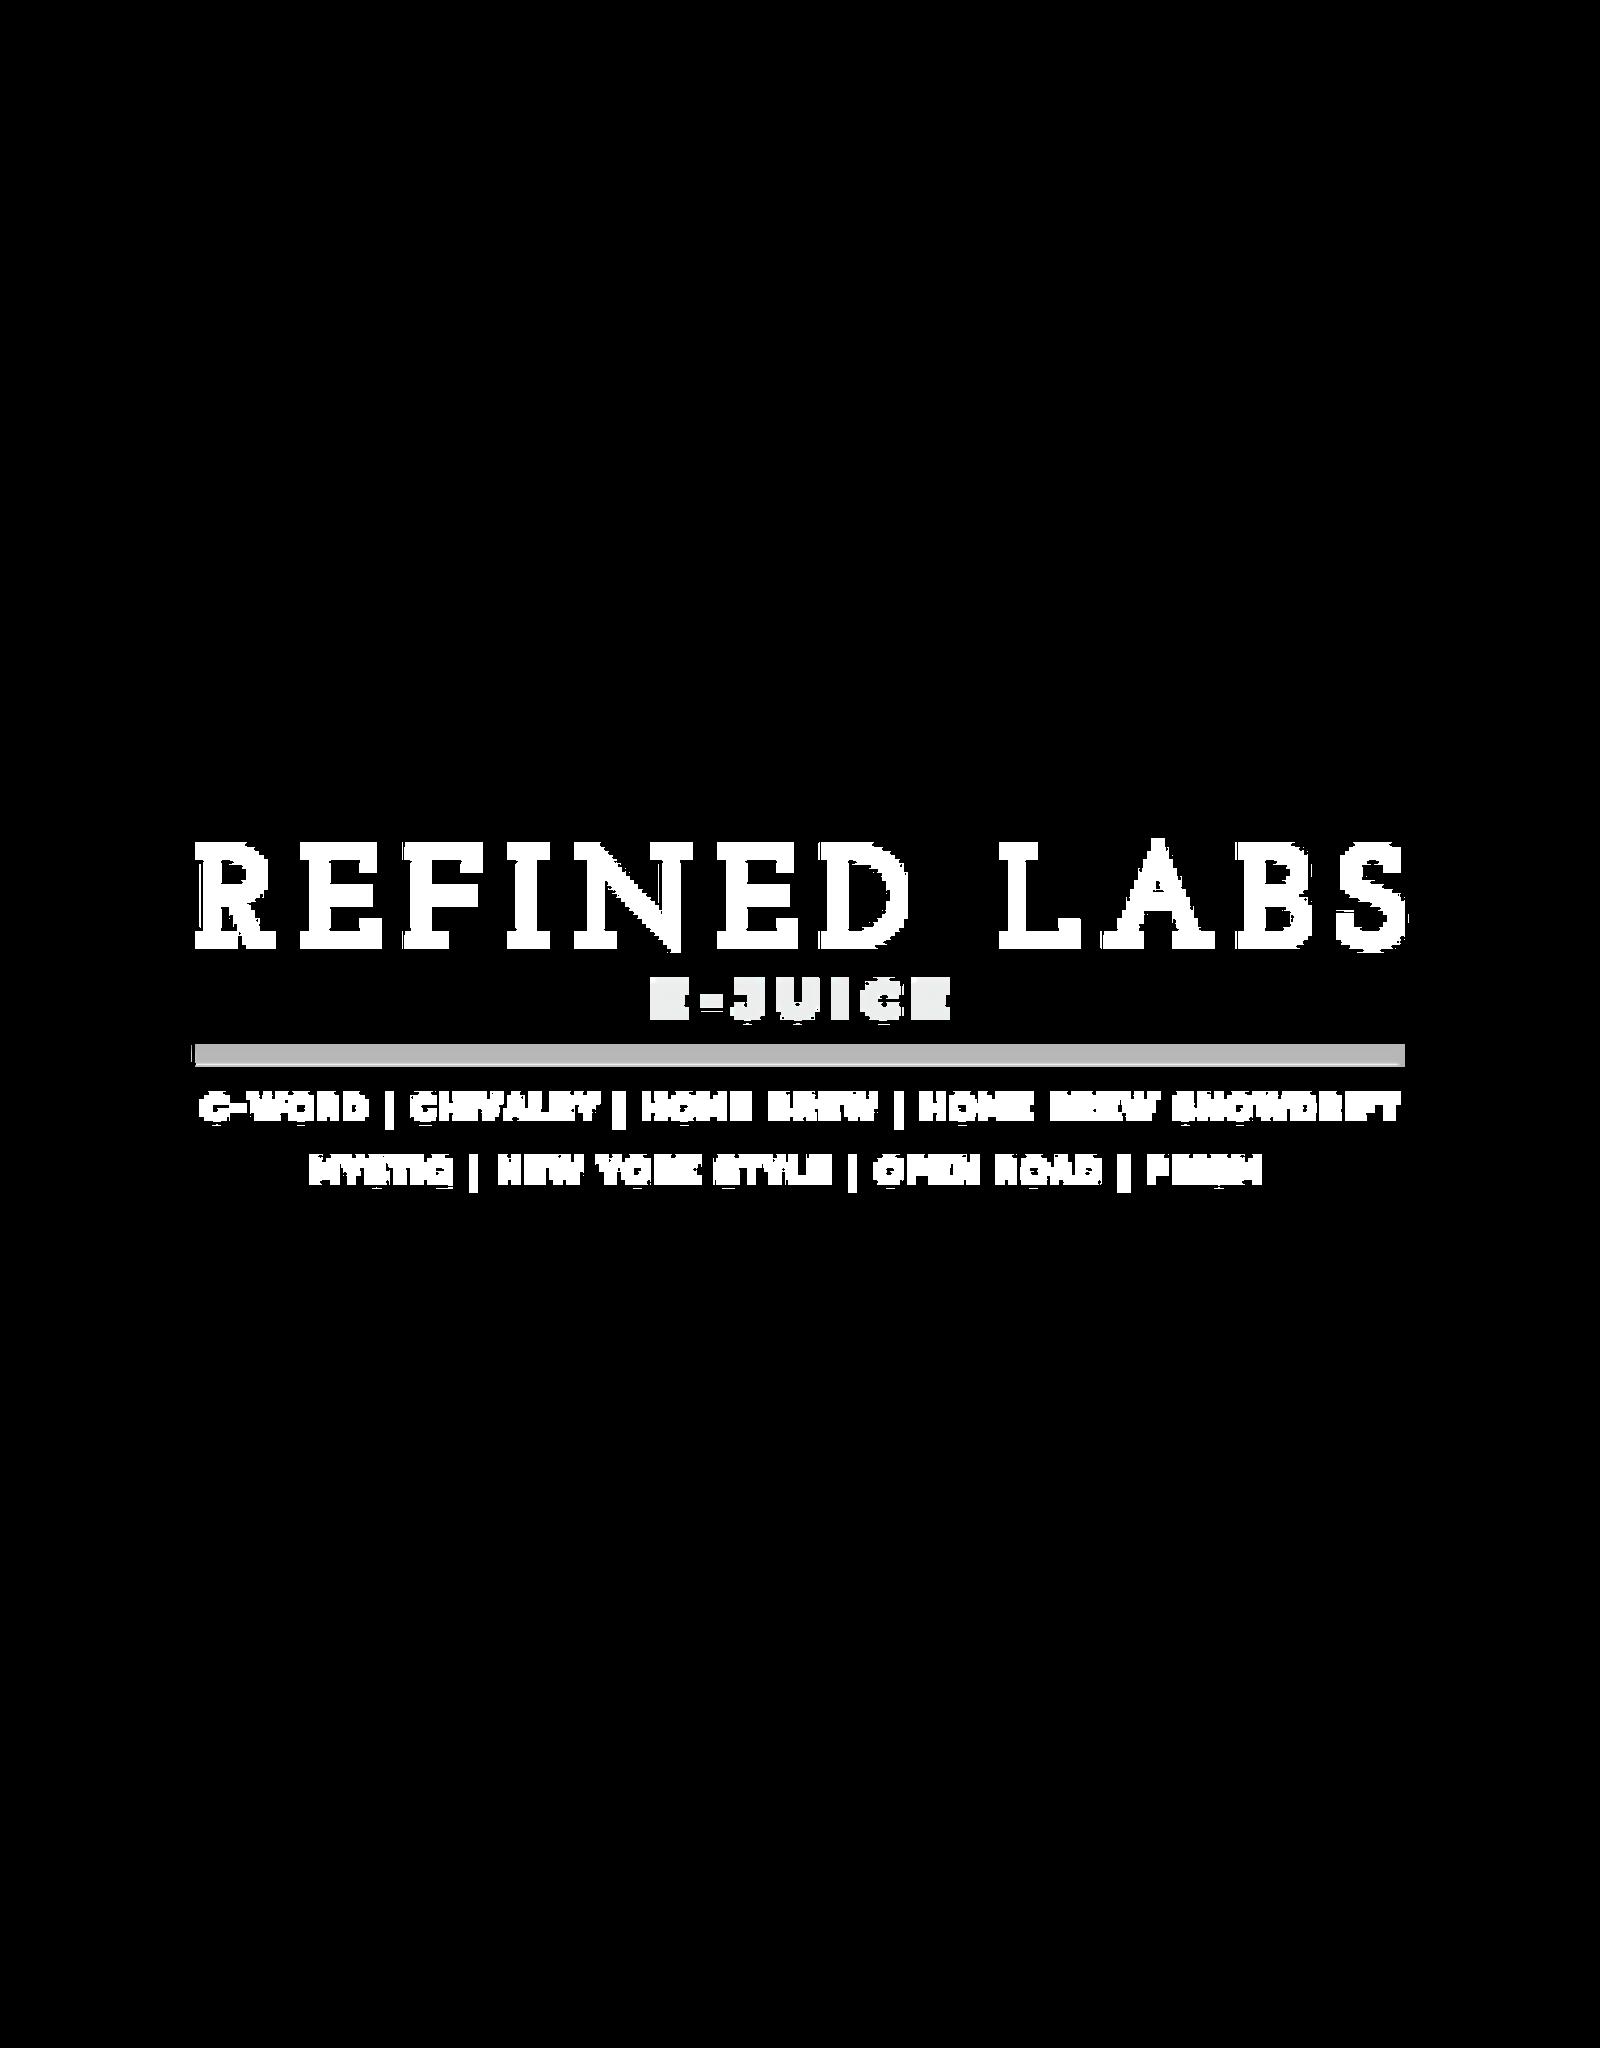 Refined Labs C-Word E-juice (60mL)